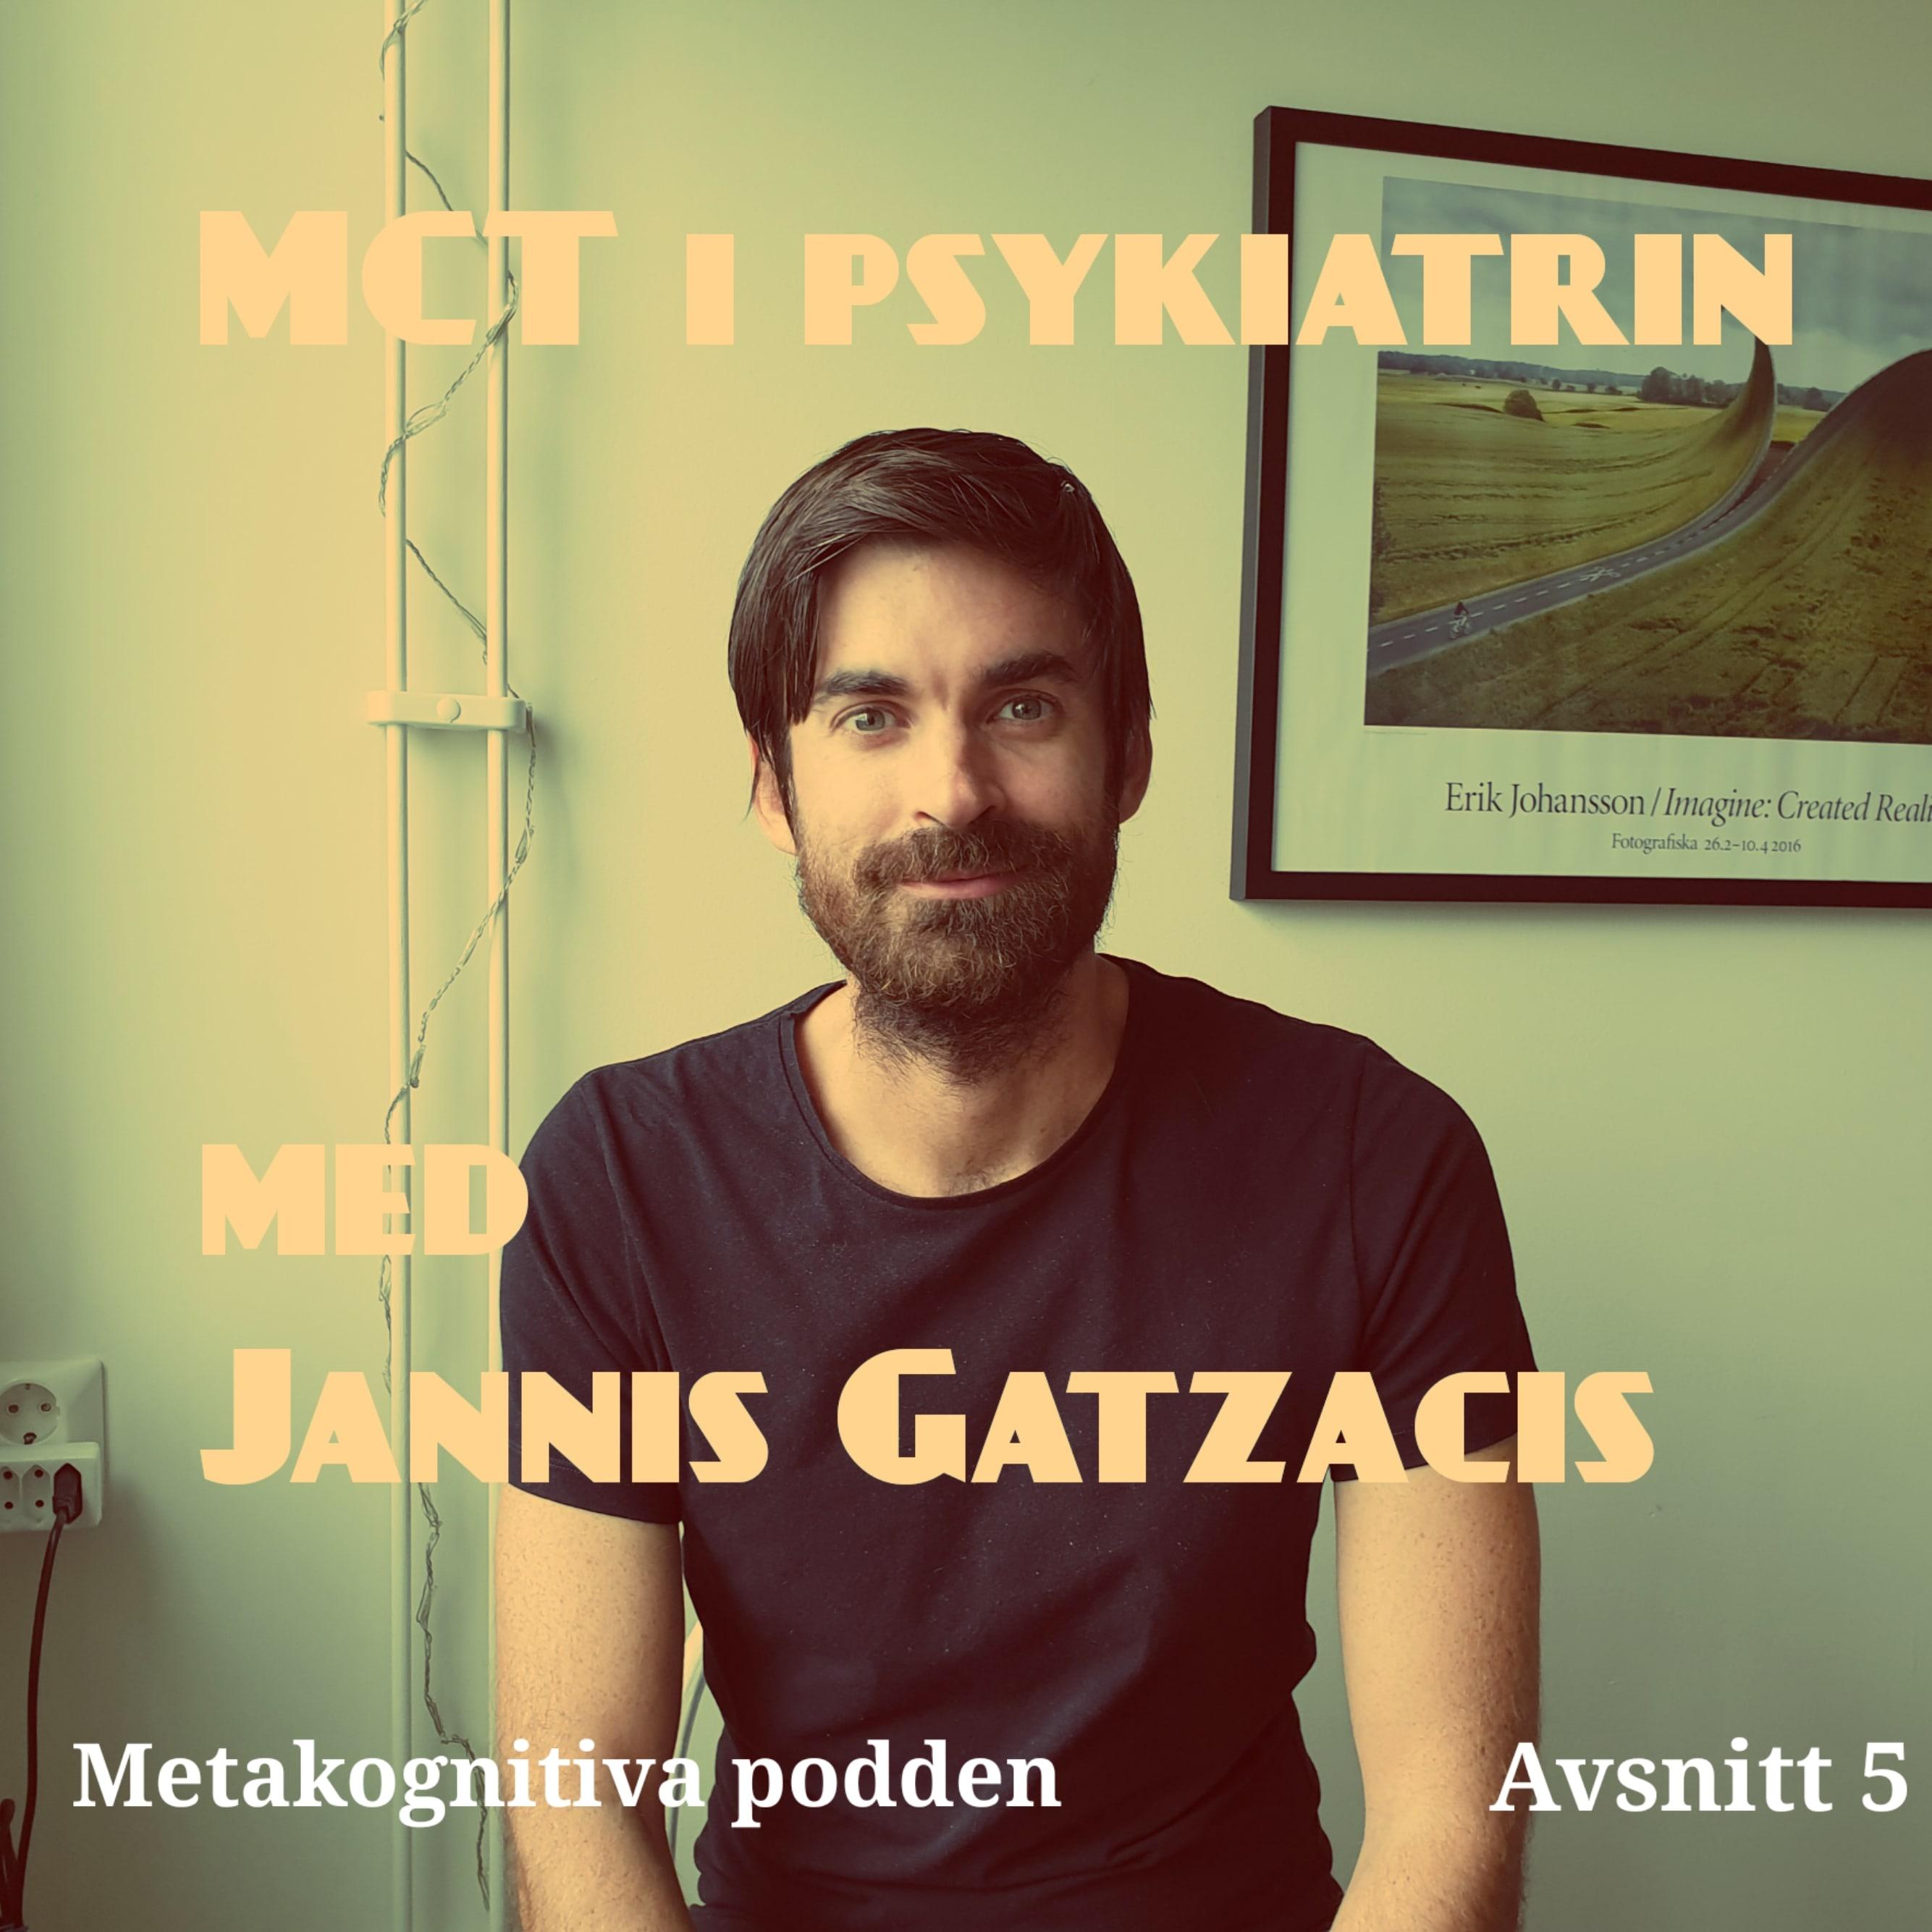 5. MCT i psykiatrin, med Jannis Gatzacis